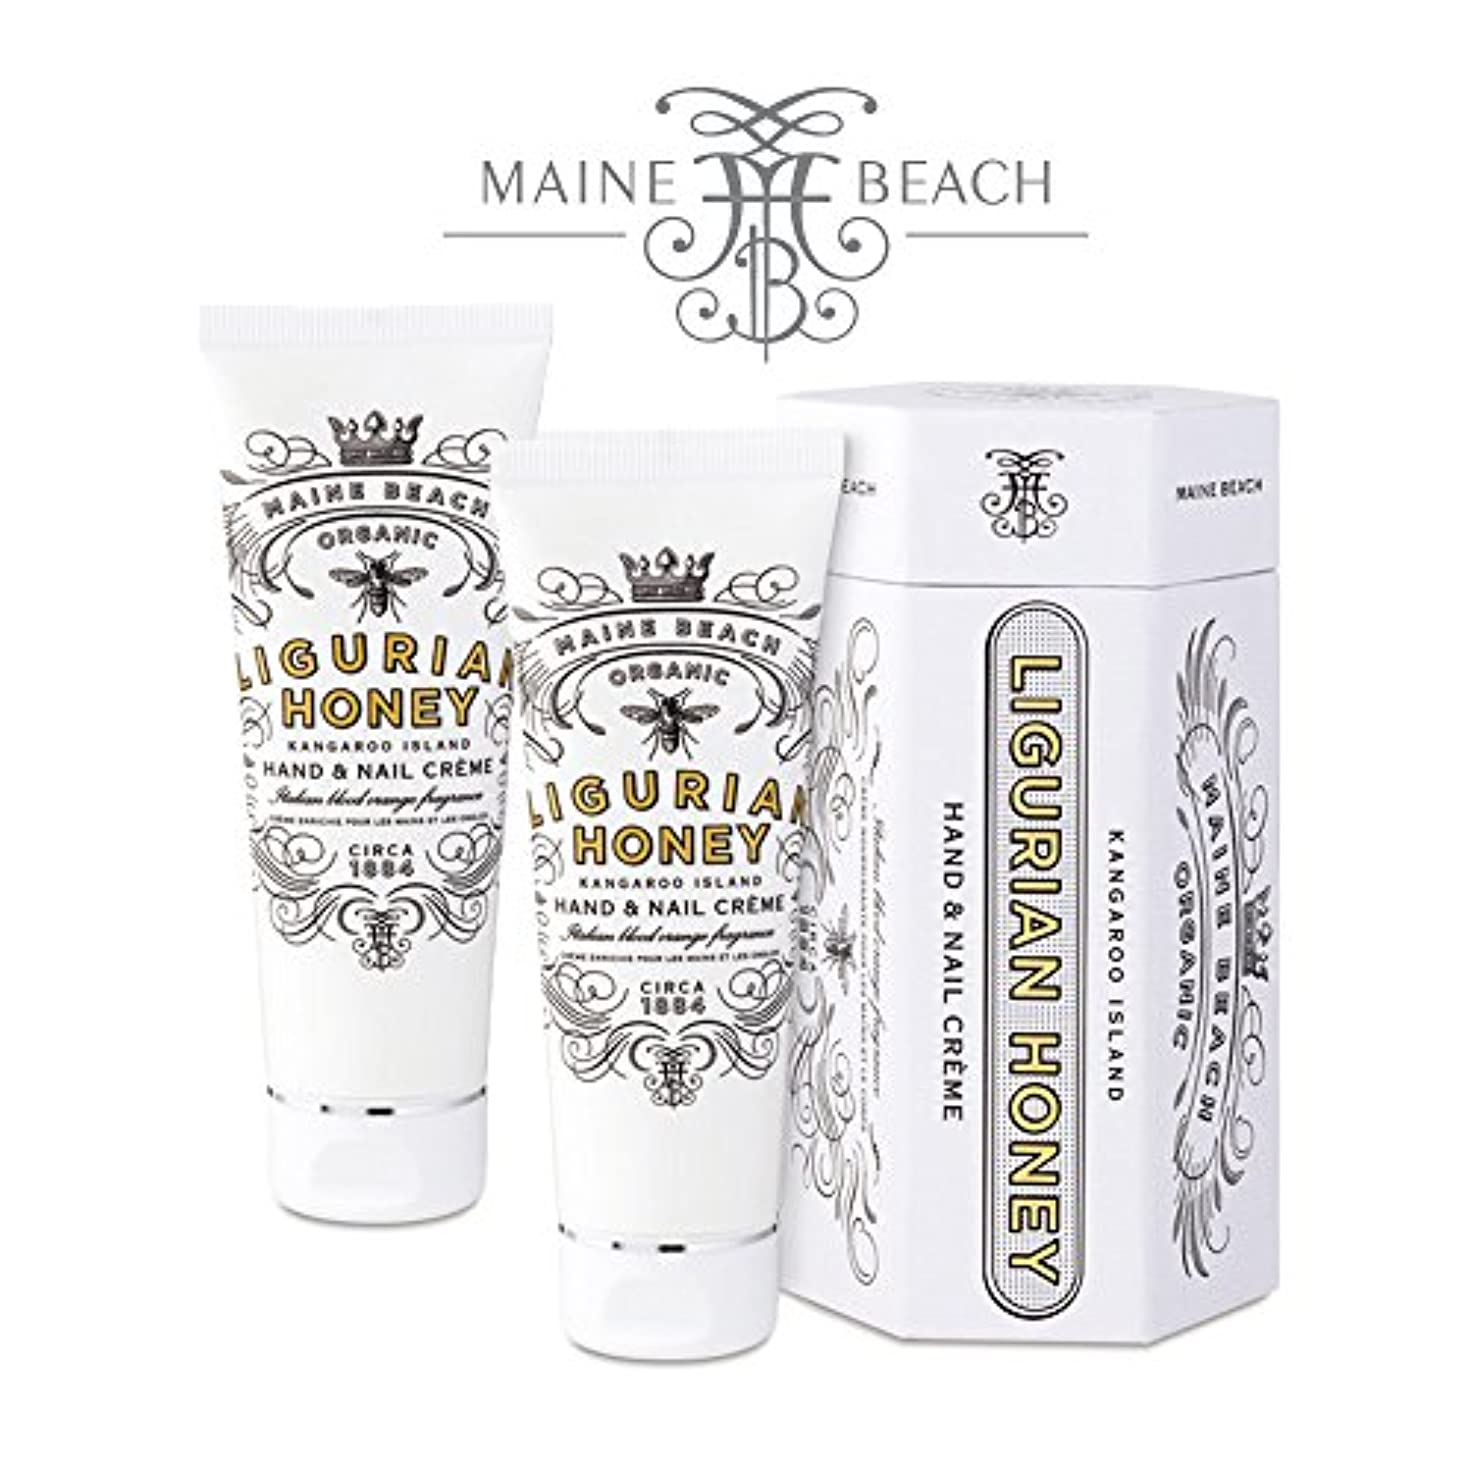 MAINE BEACH マインビーチ LIGURIAN HONEY Series リグリアンハニーシリーズ ハンド&ネイルクリーム 2個セット